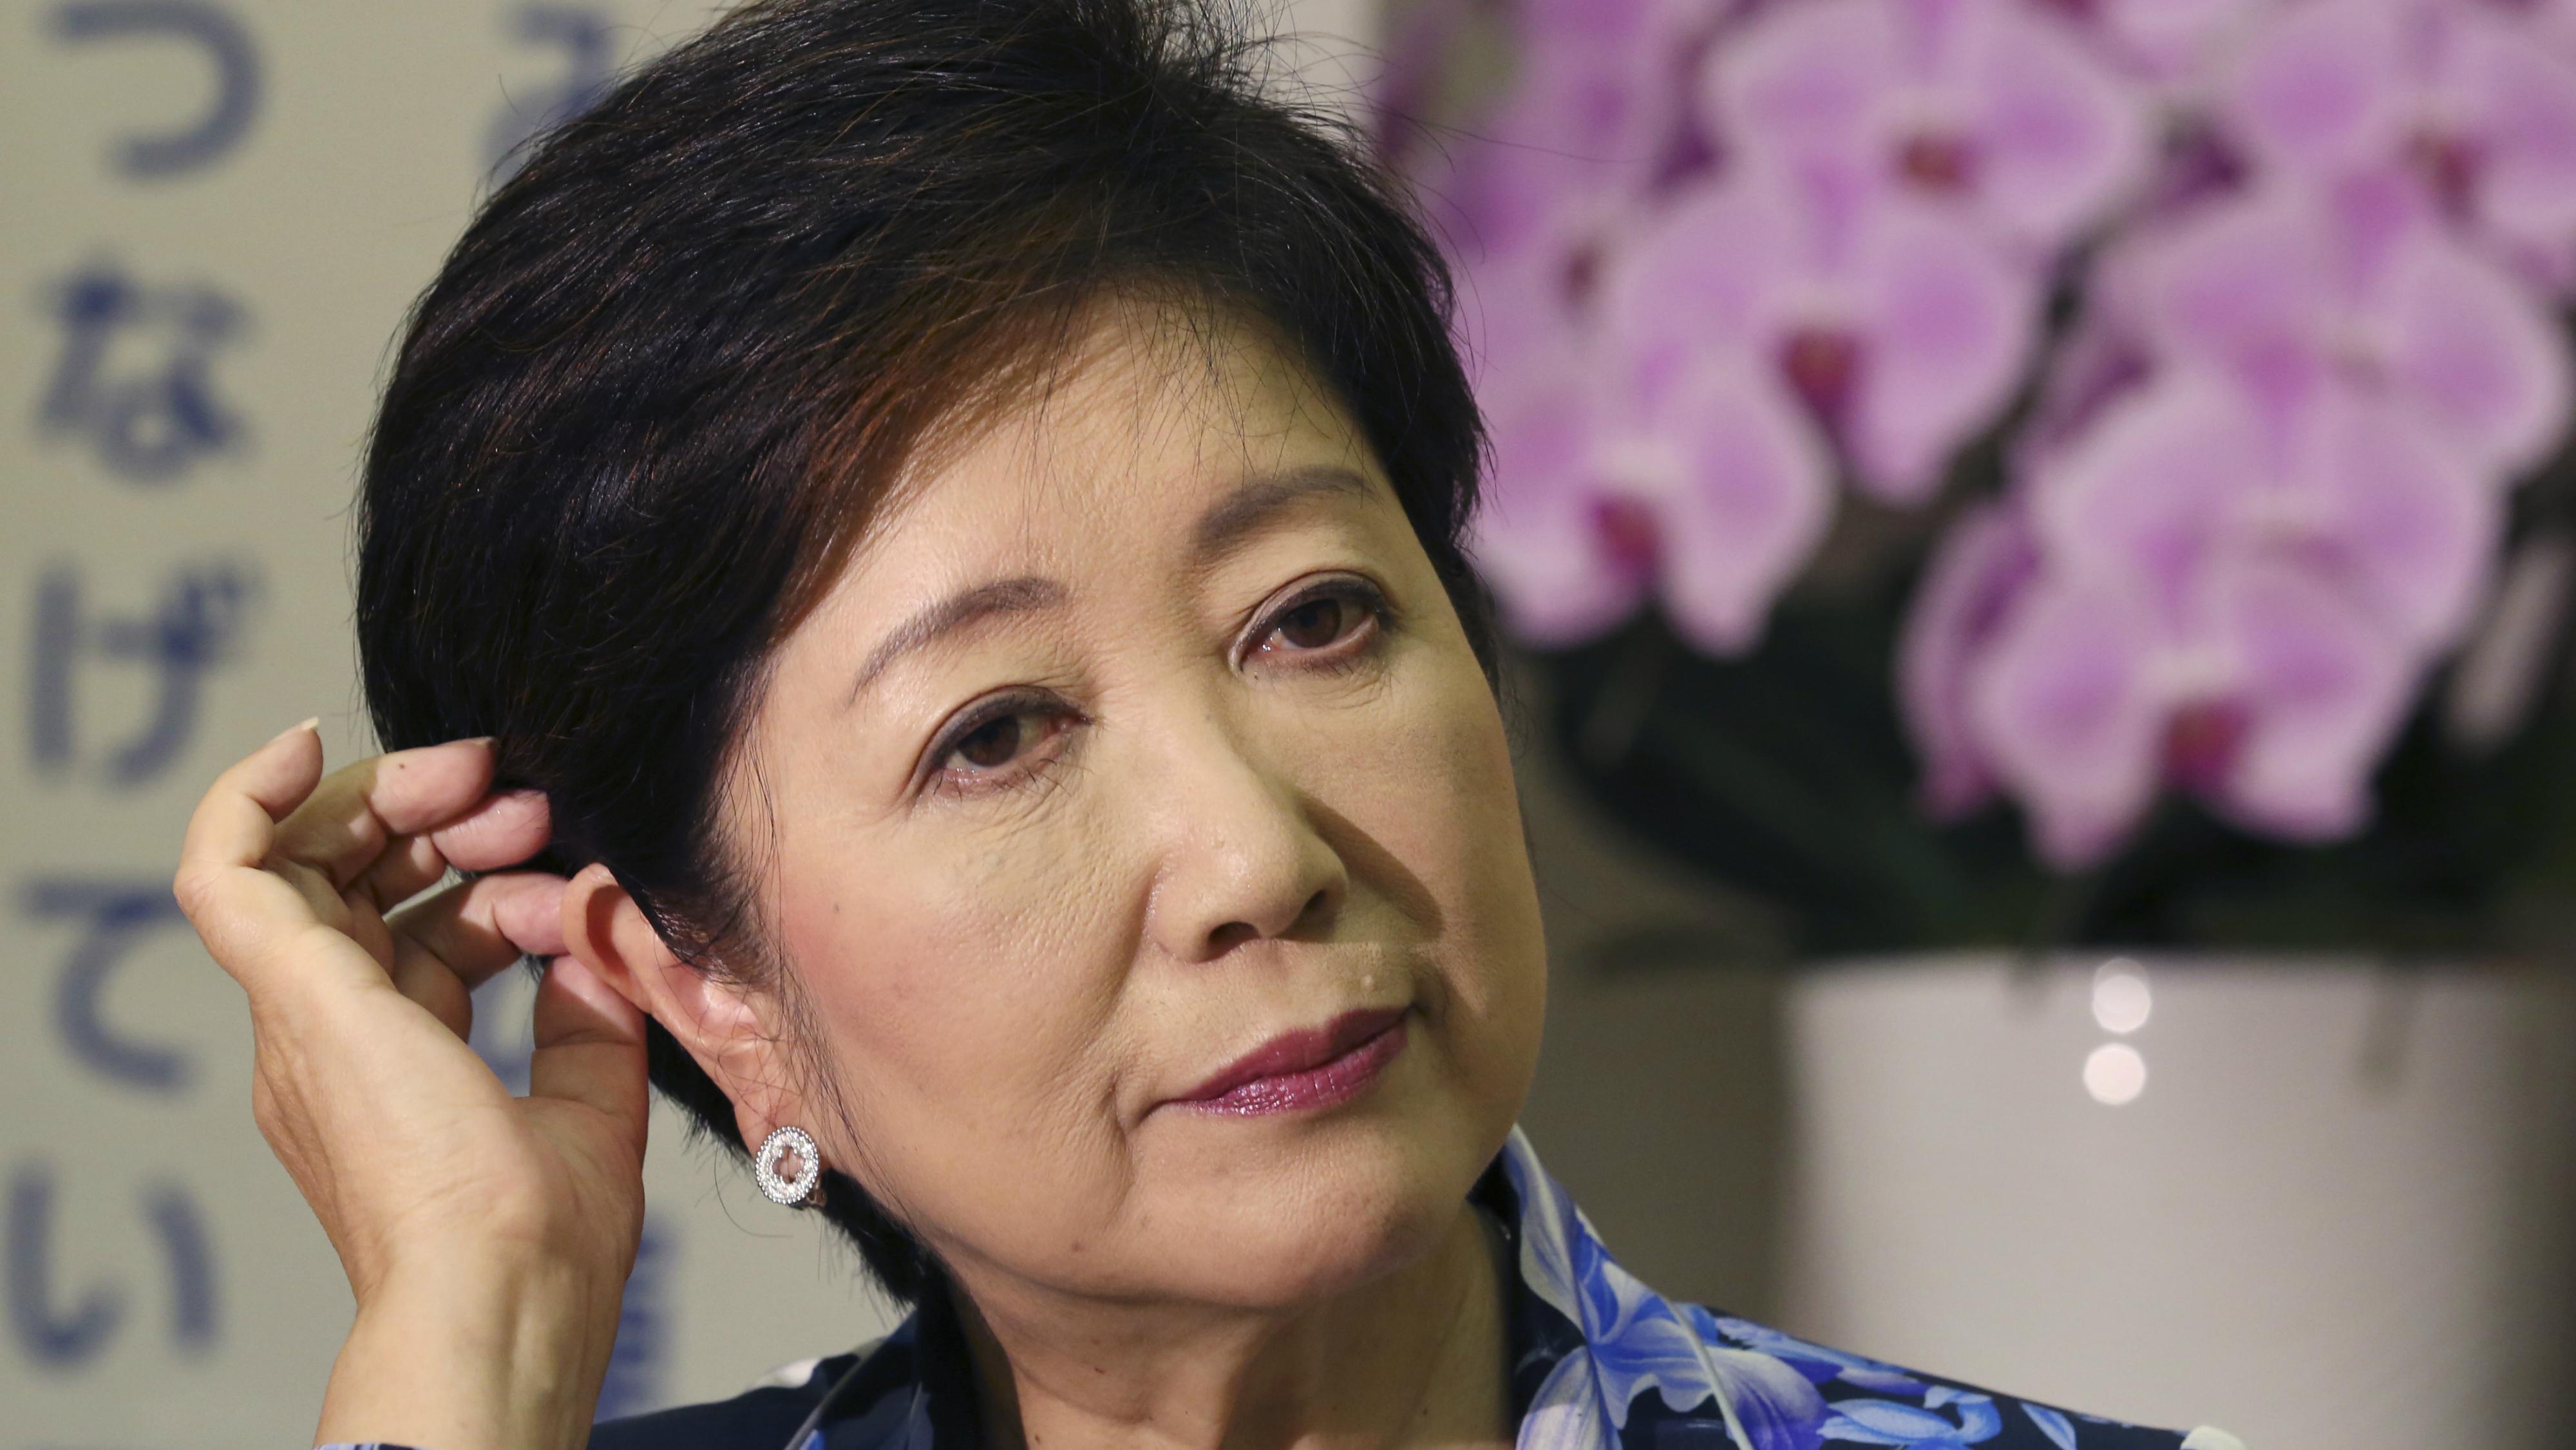 Tokyo Governor Yuriko Koike adjusts her hair during an interview